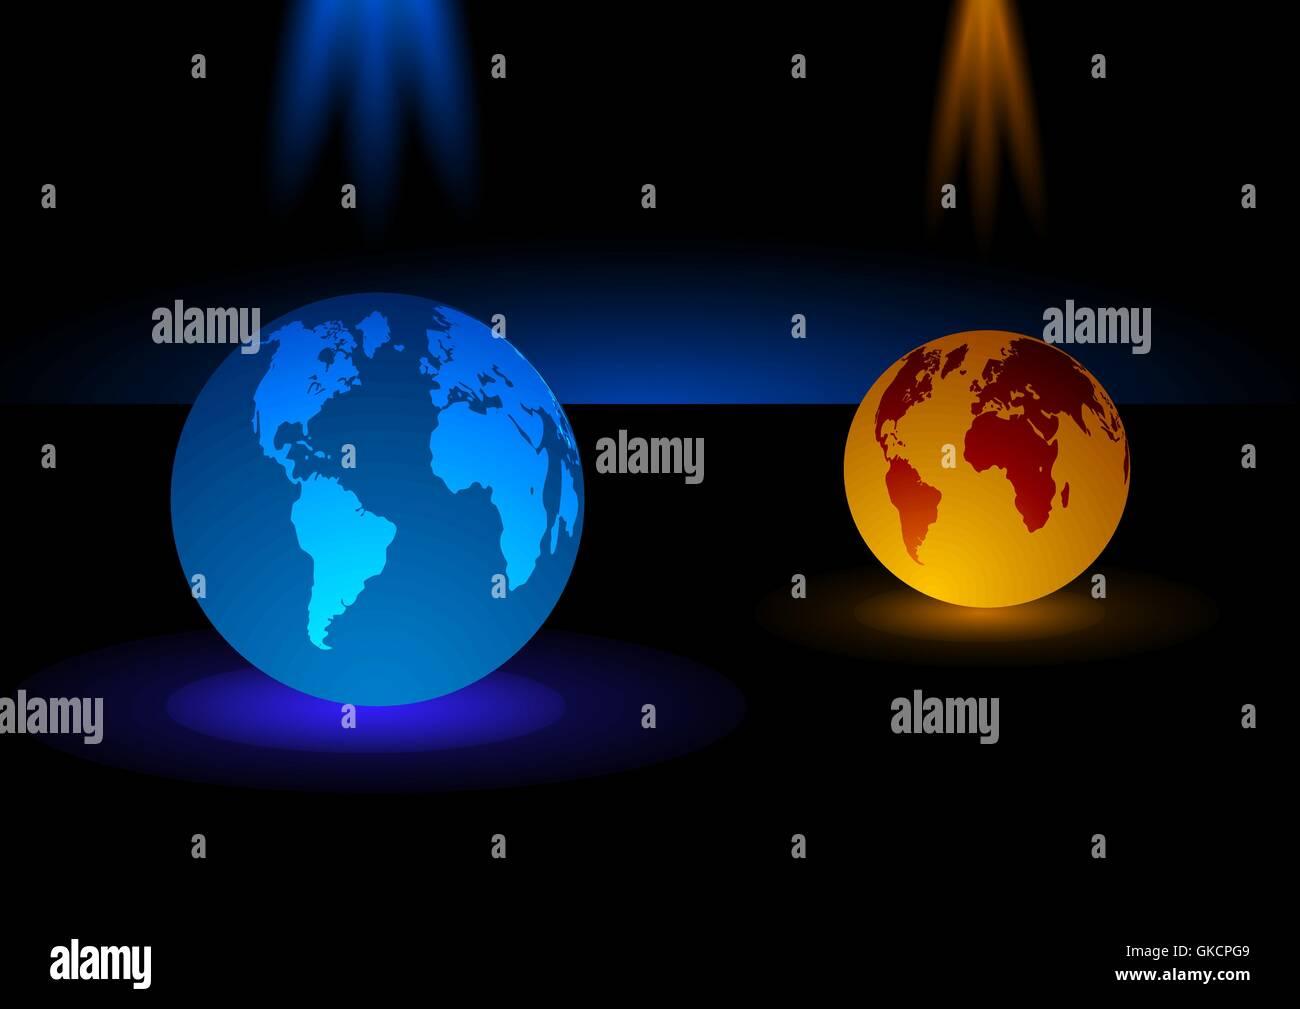 Moderne Glas-blau und Orange Kugel-Hintergrund, Vektor-illustration Stockbild